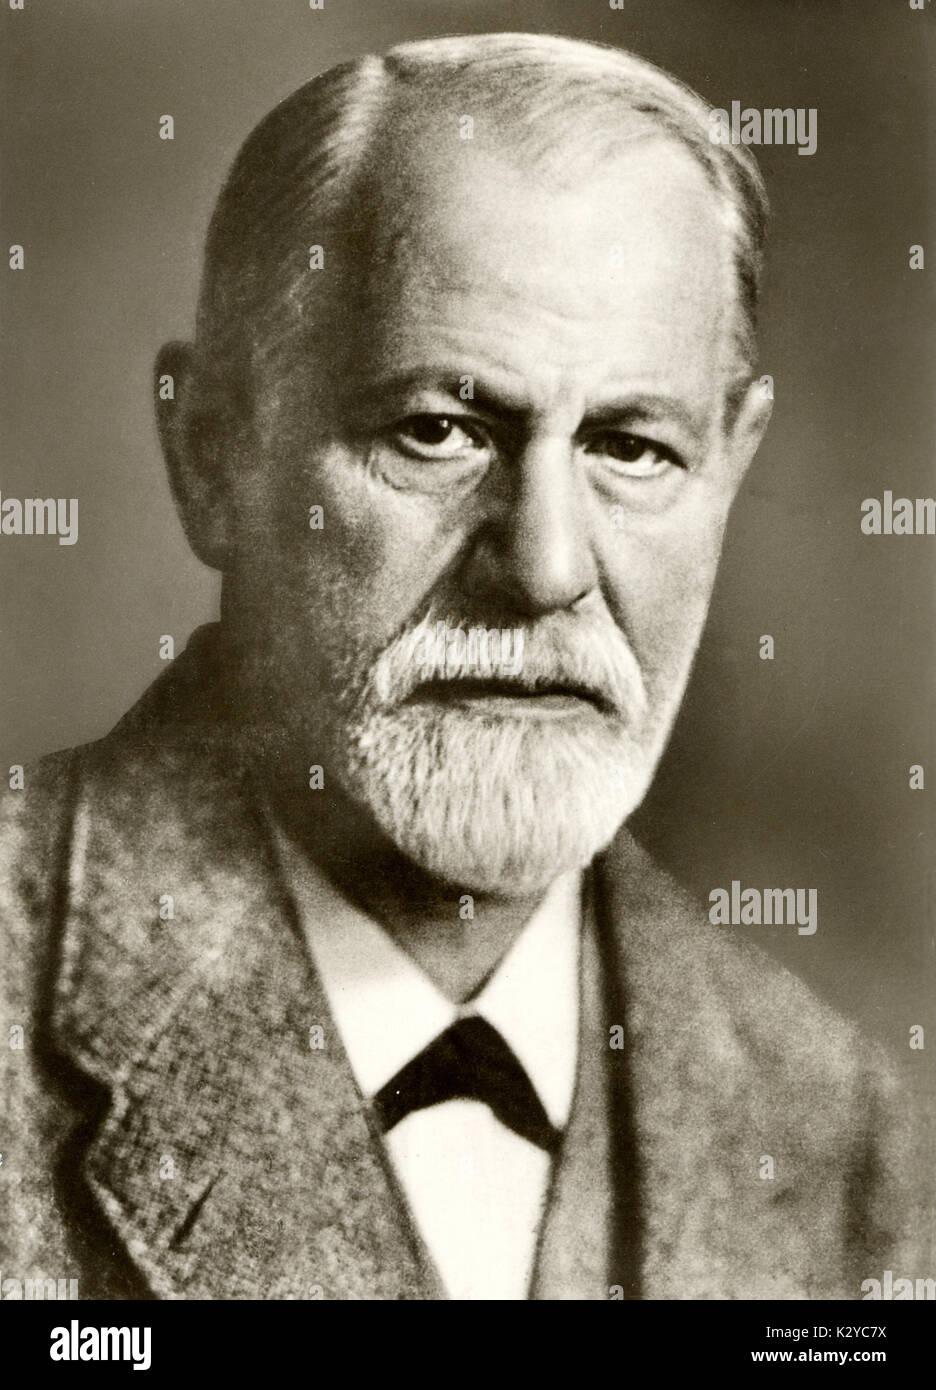 Sigmund Freud, founder of psychoanalysis. born Moravia, 1856-1939. Stock Photo